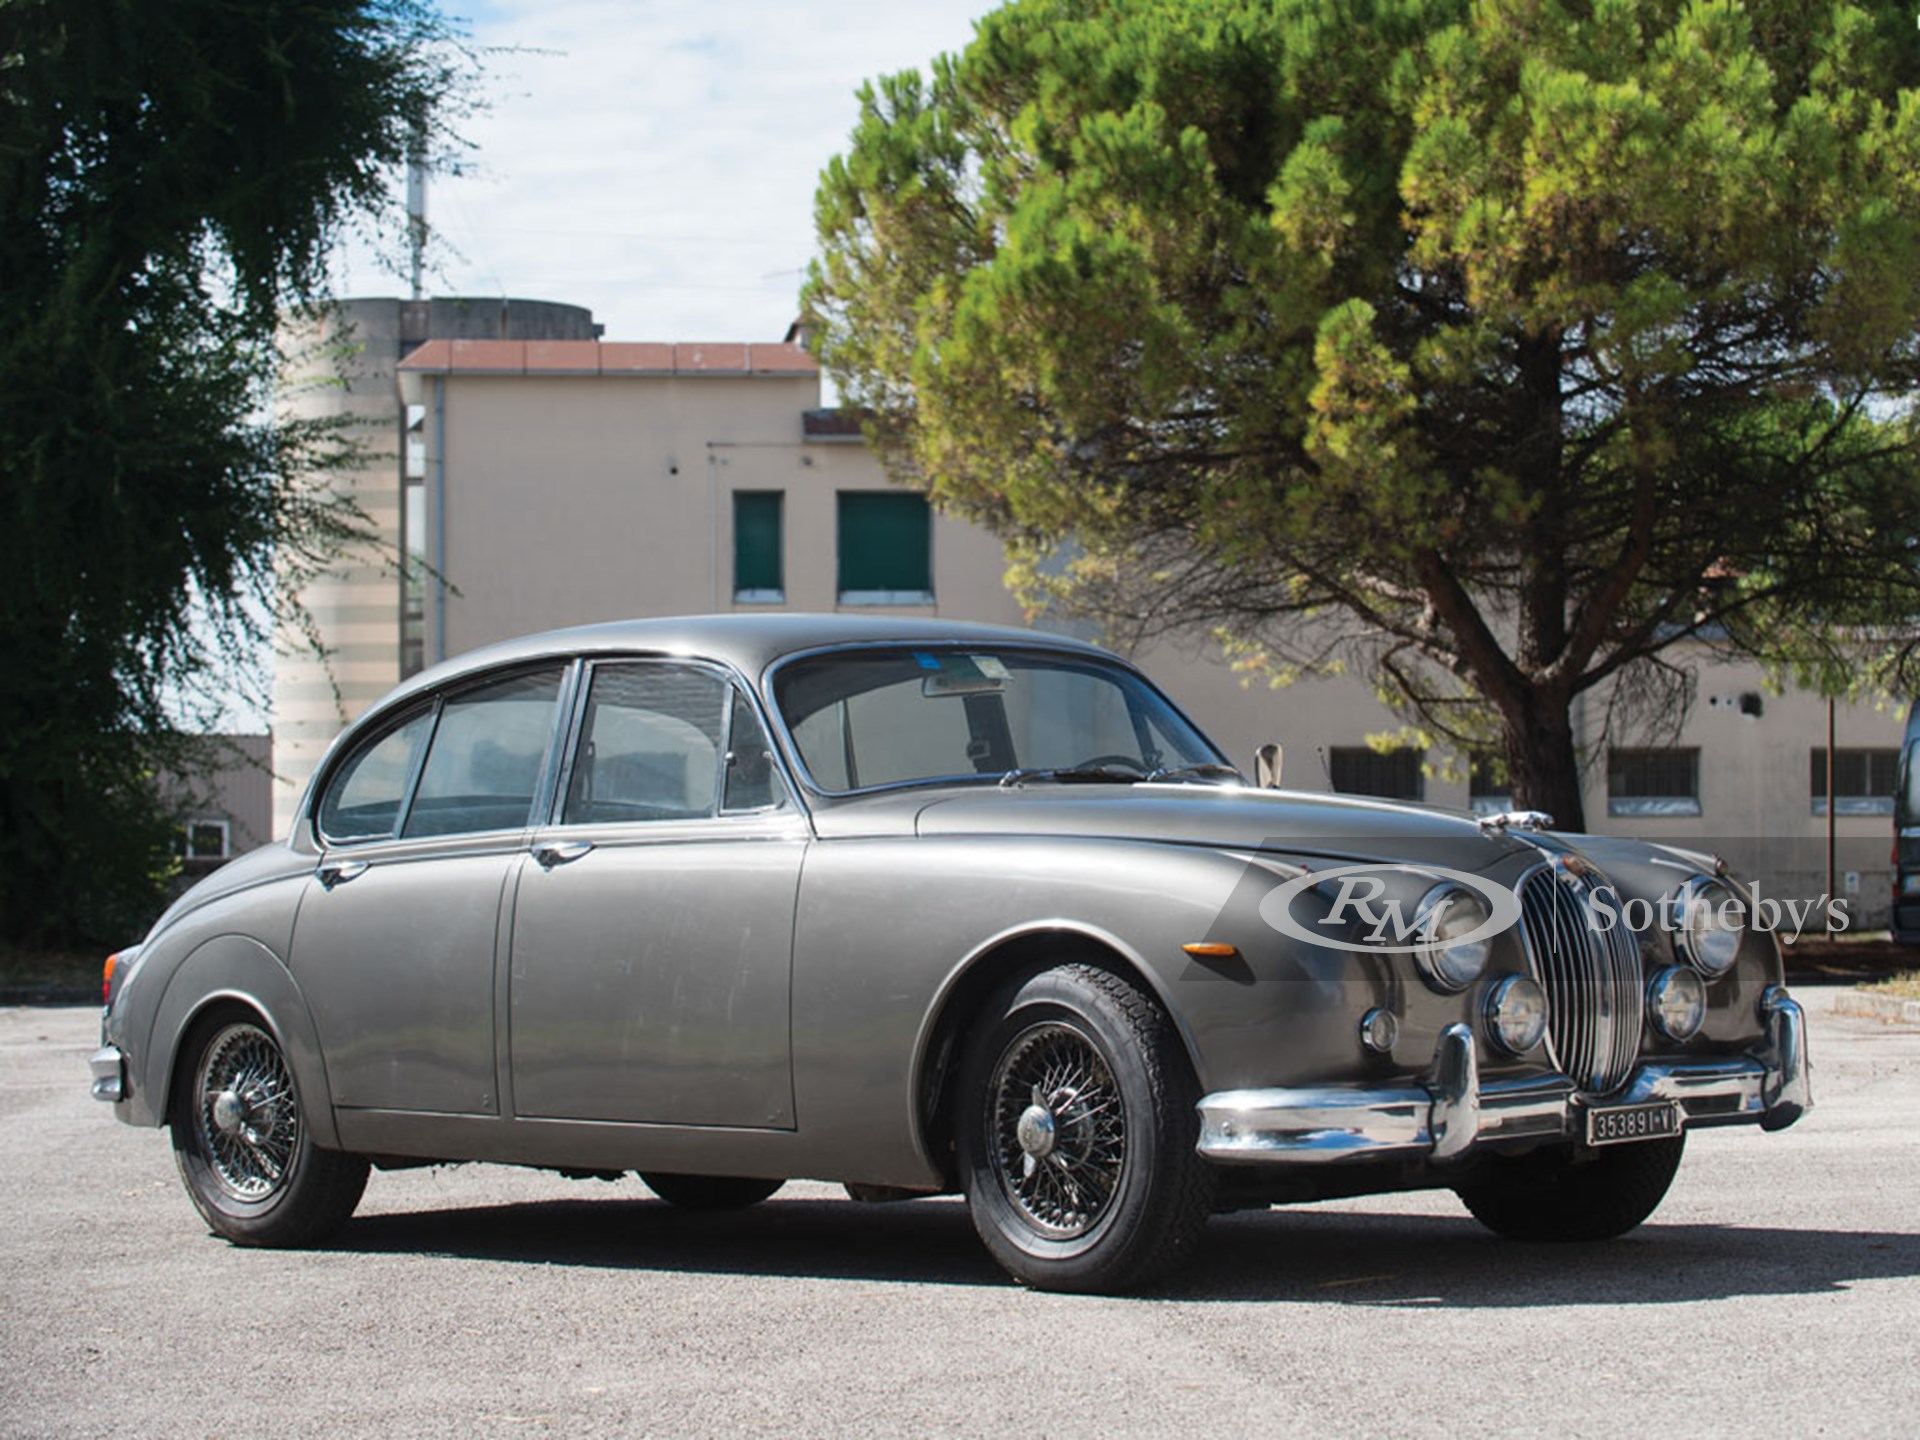 1962 Jaguar Mark II 3.8 | Duemila Ruote 2016 | RM Auctions